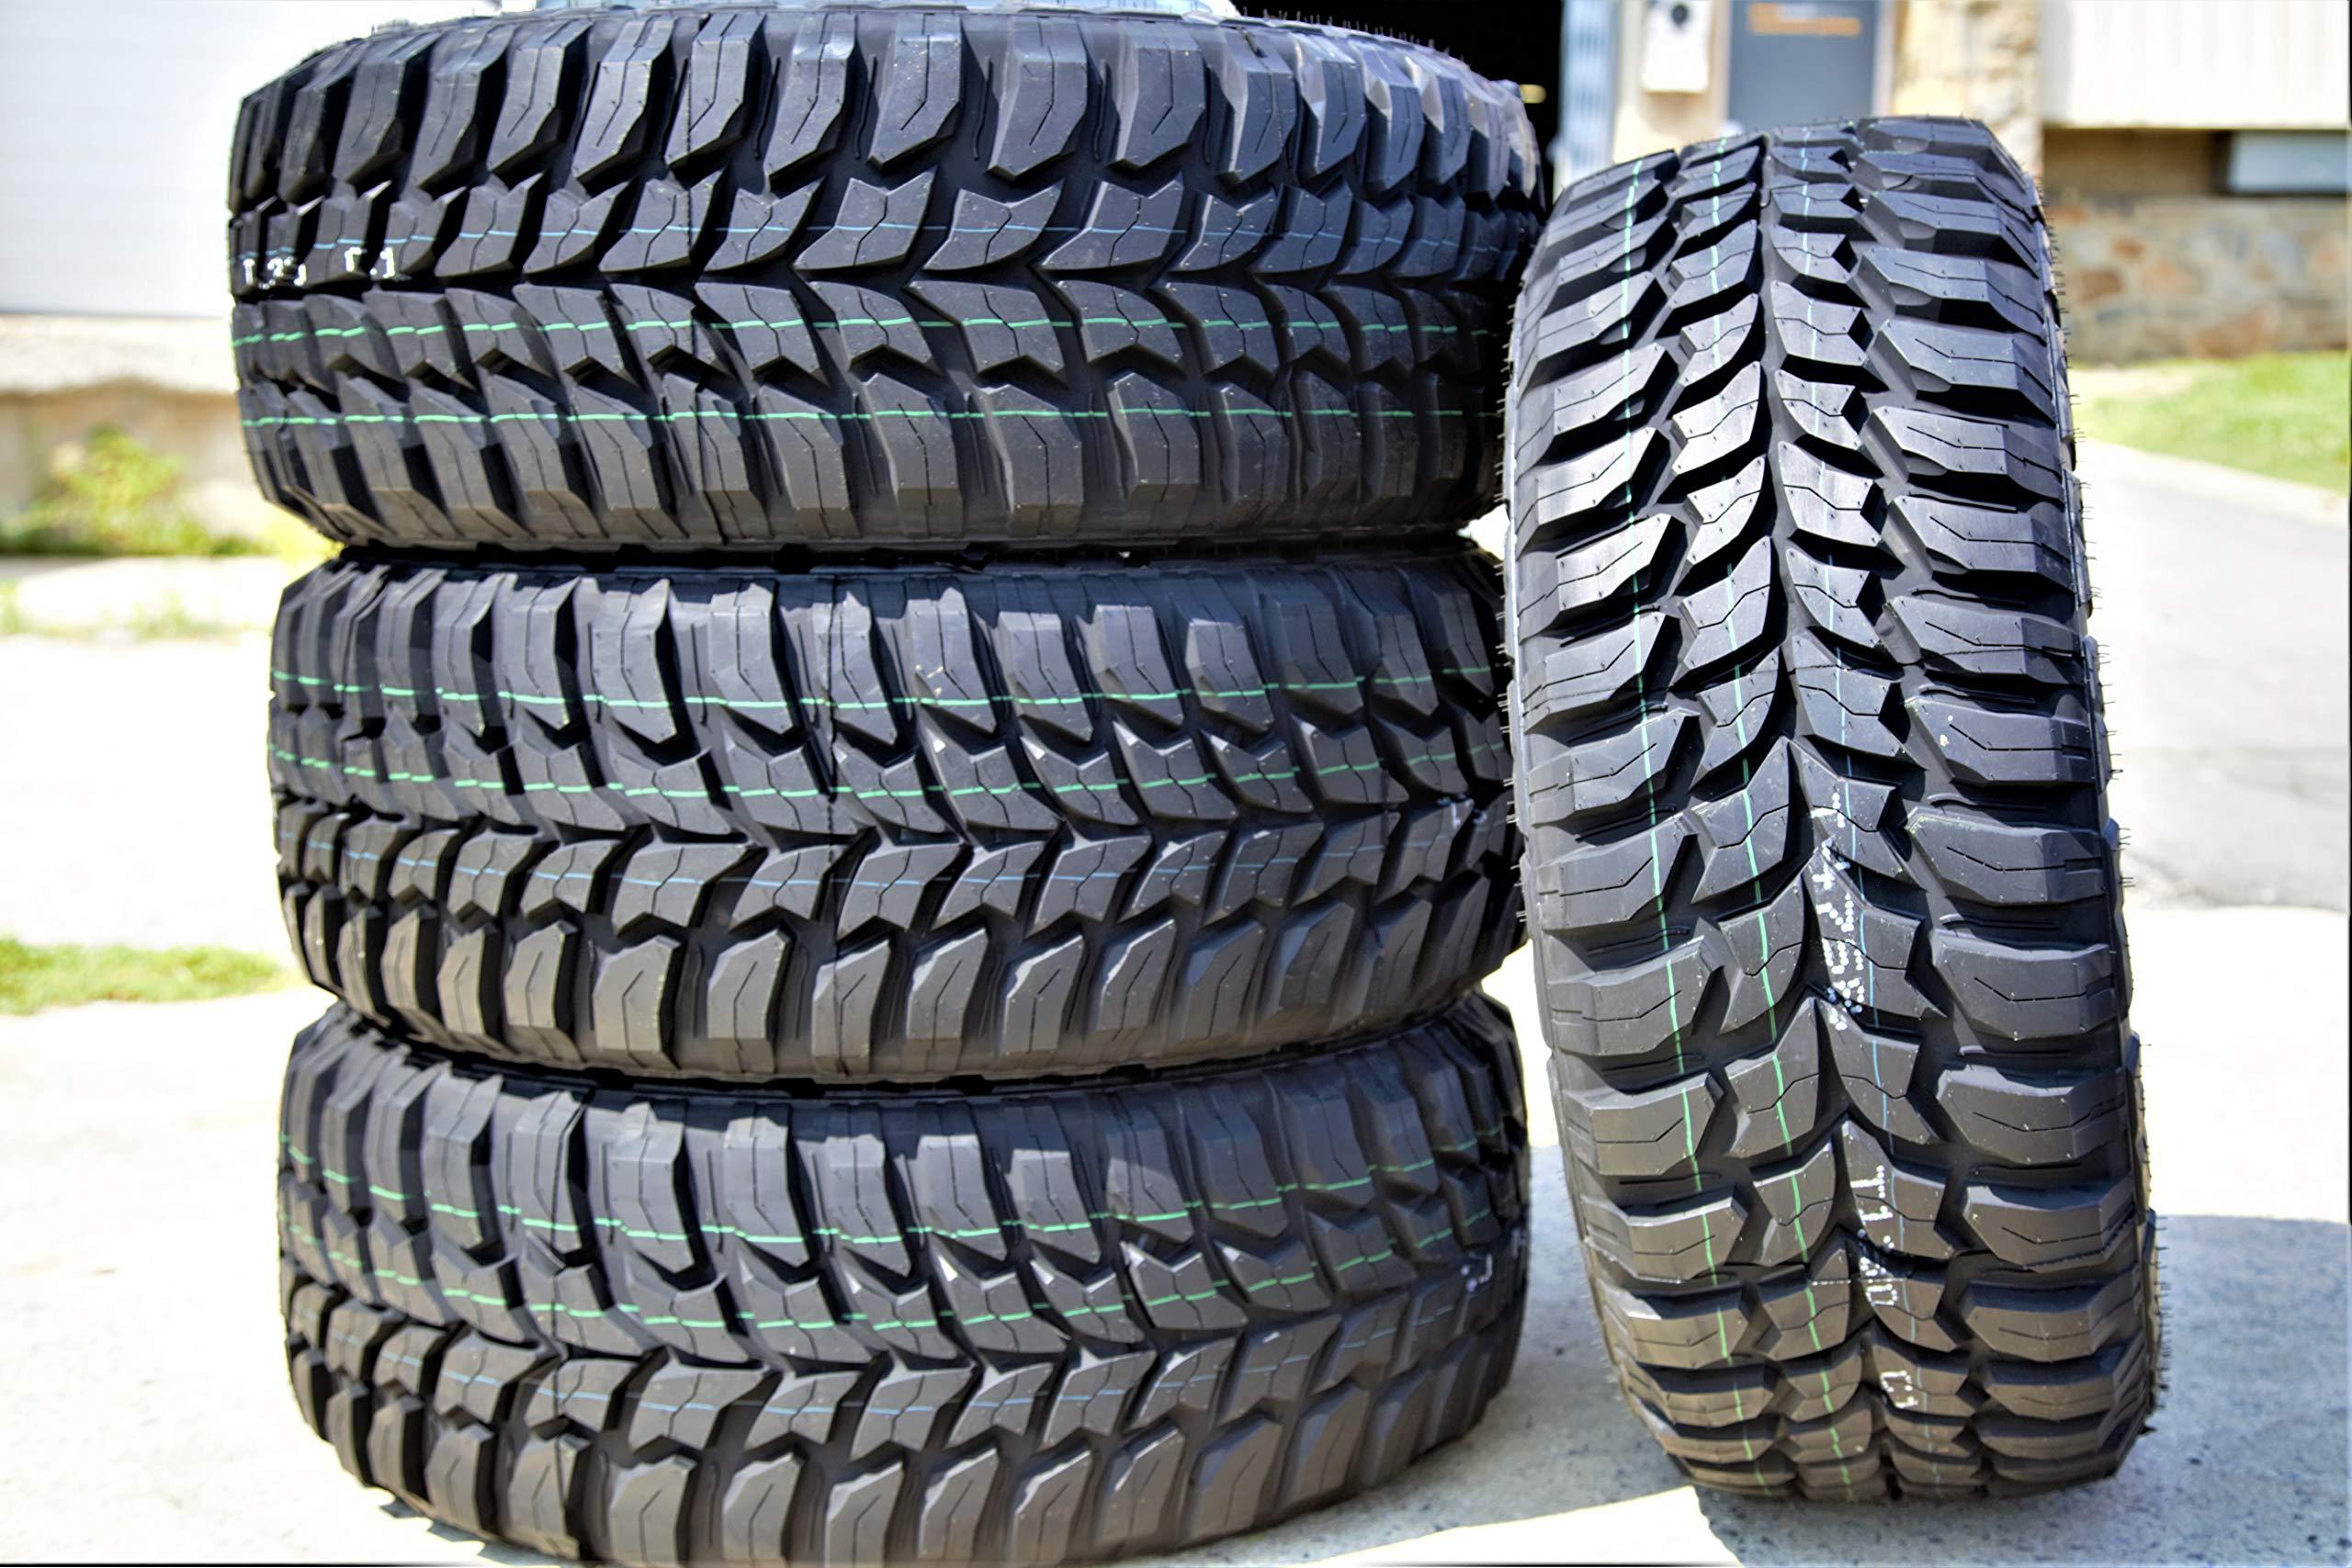 Set of 4 (FOUR) Crosswind M/T Mud Radial Tires-LT315/75R16 127/124Q LRE 10-Ply